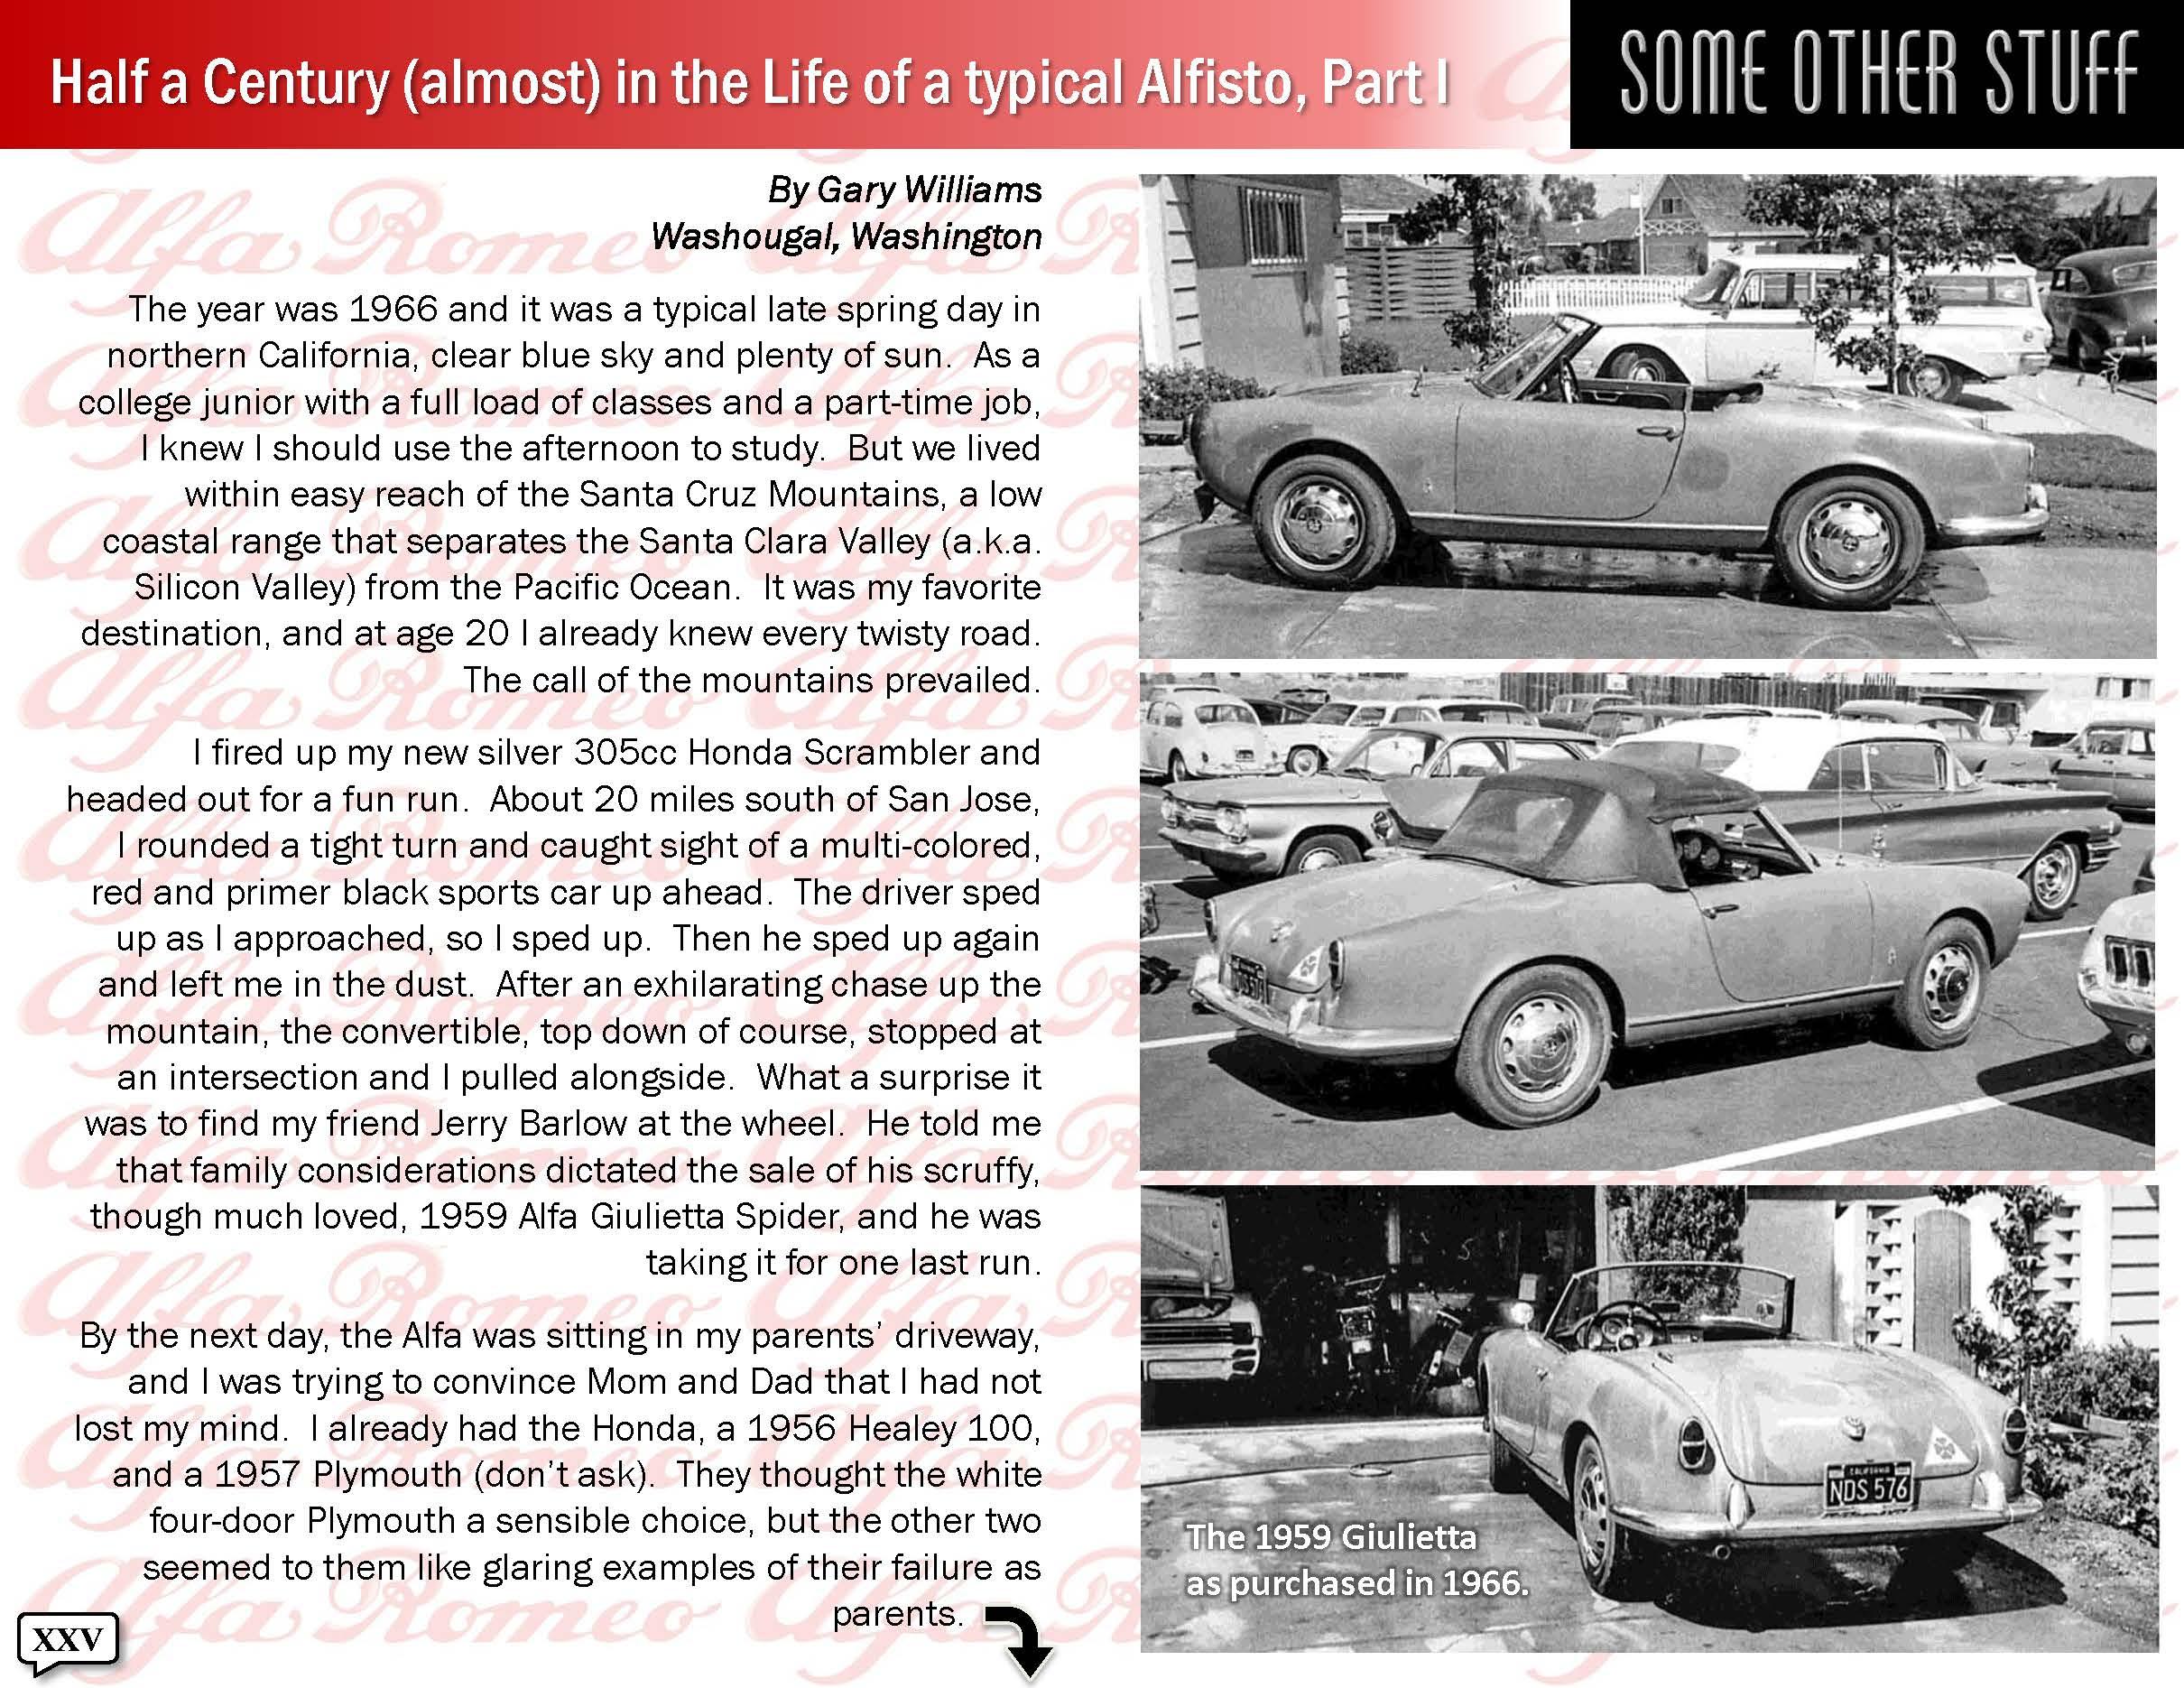 www.alfaclub.org_Newsletters_files_ALFA BITS 2014 02_Page_25